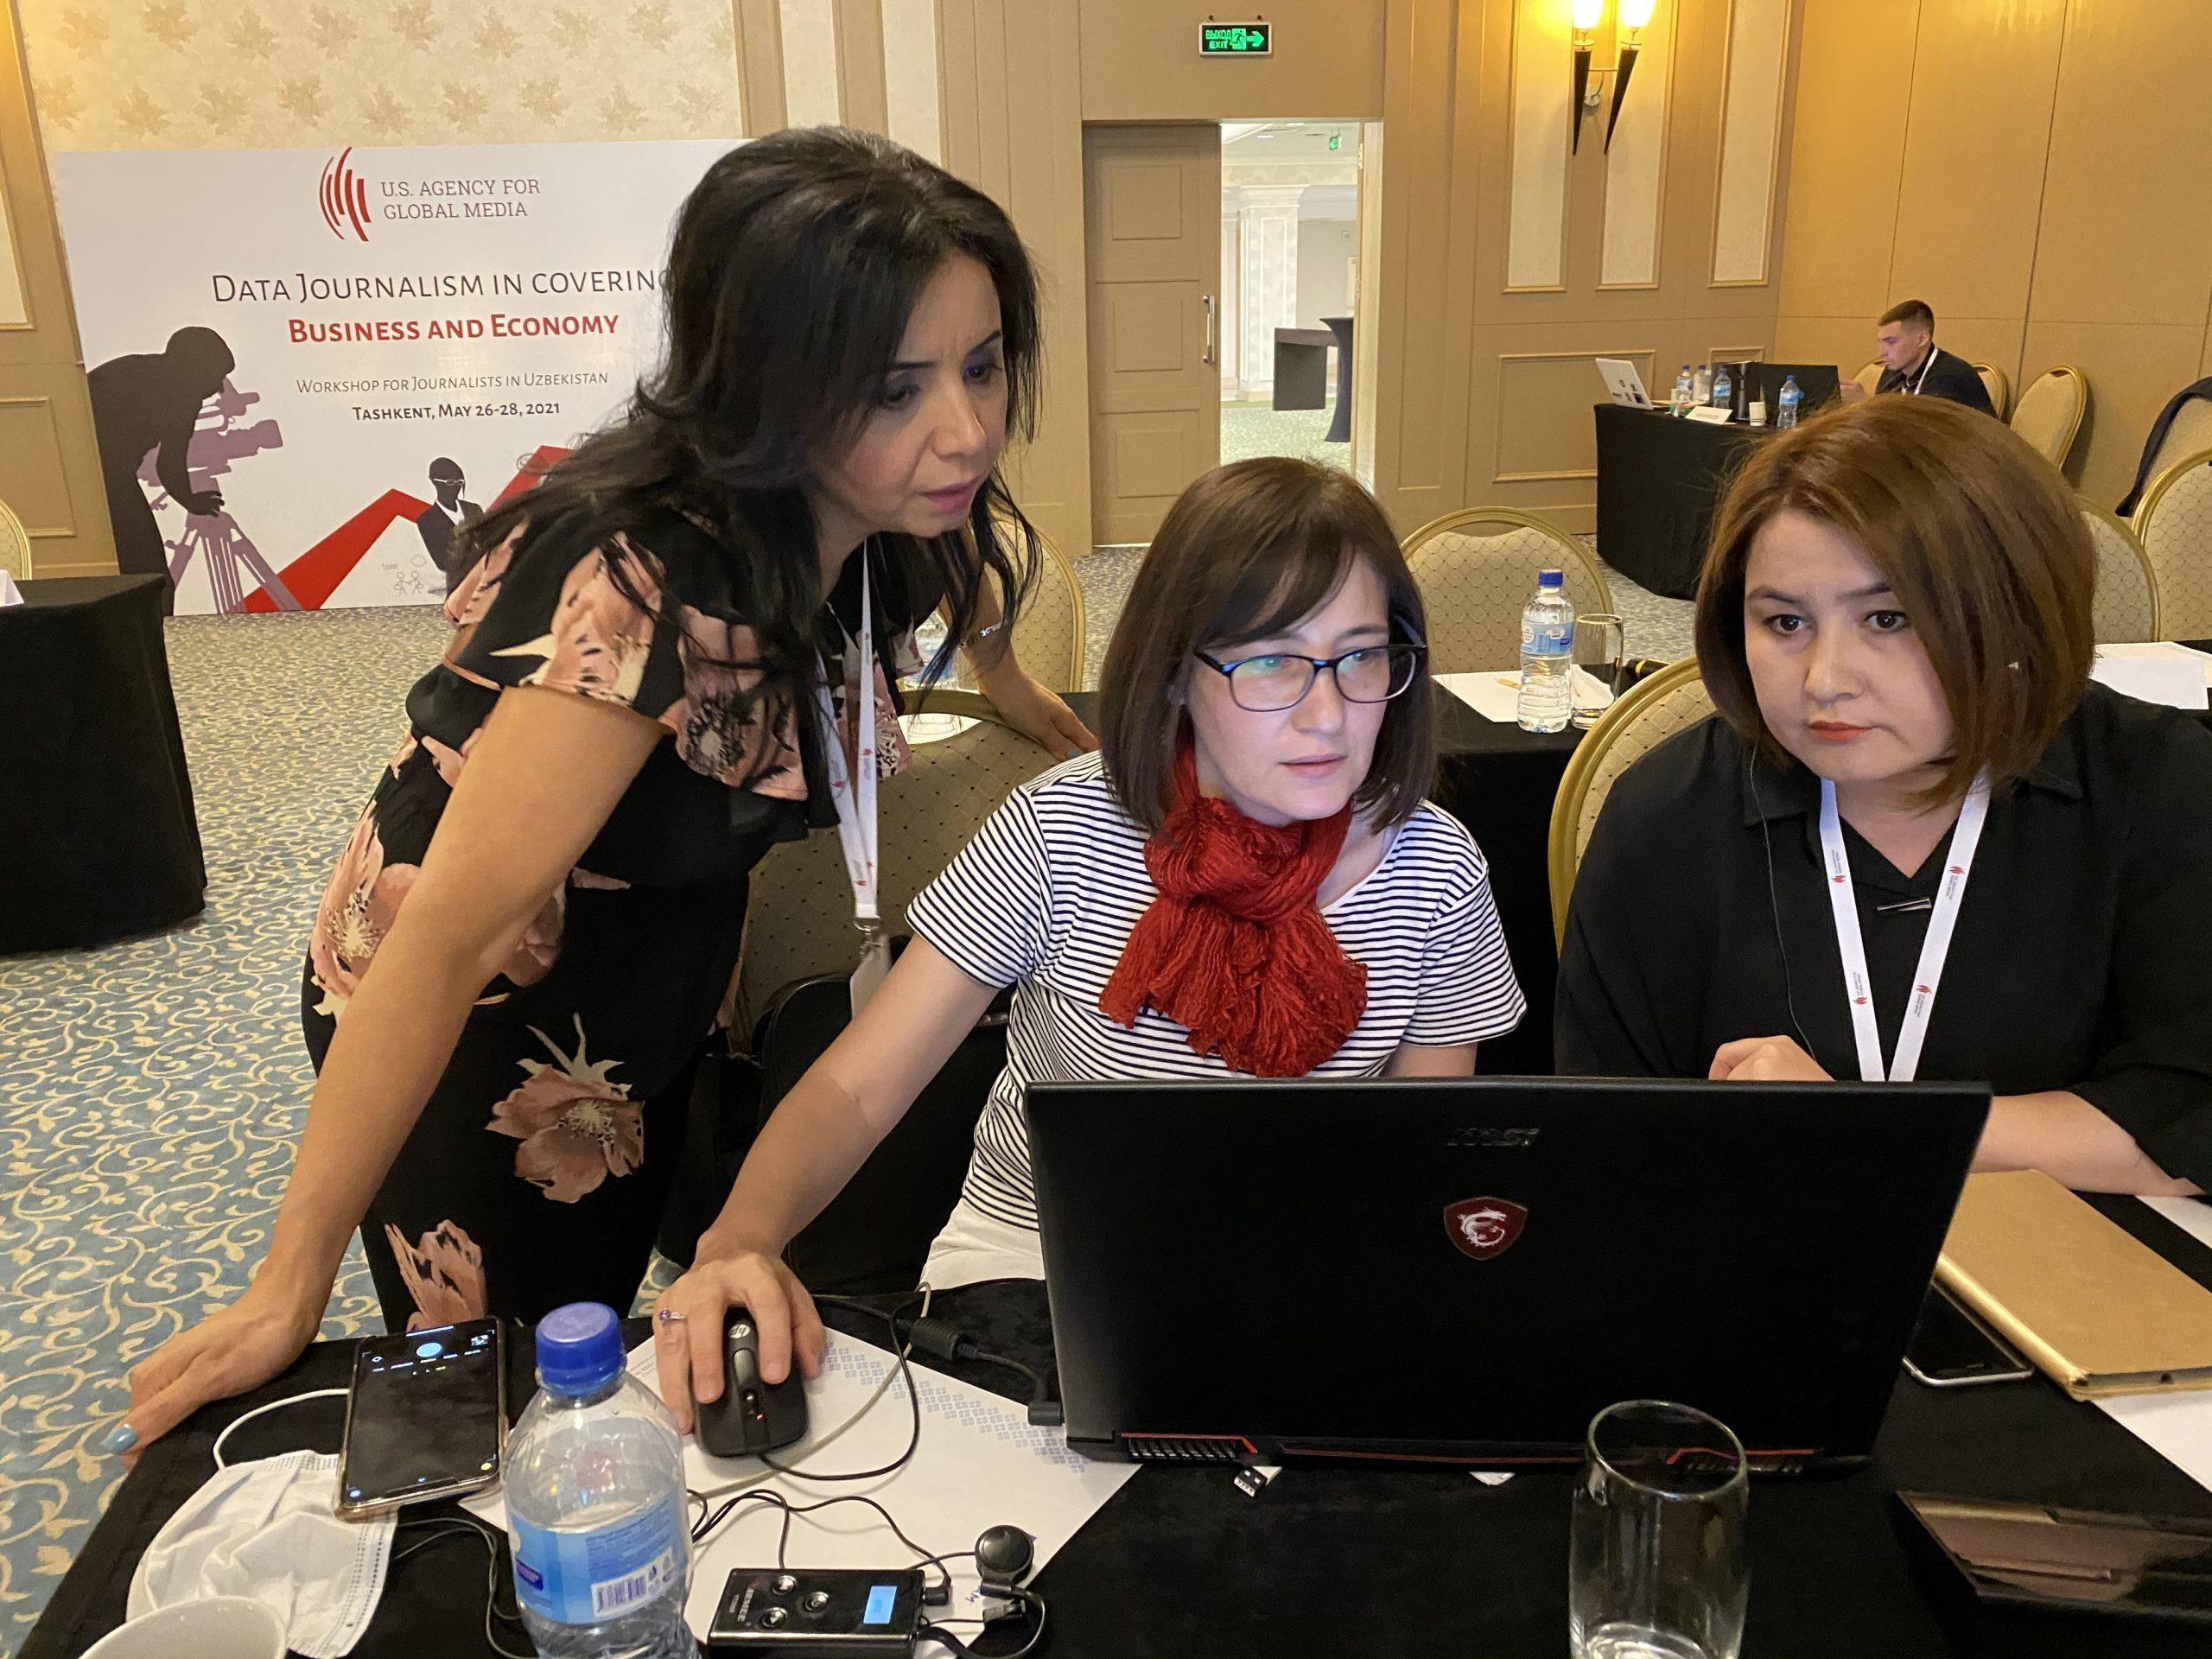 Uzbekistan: Data journalism for business reporting